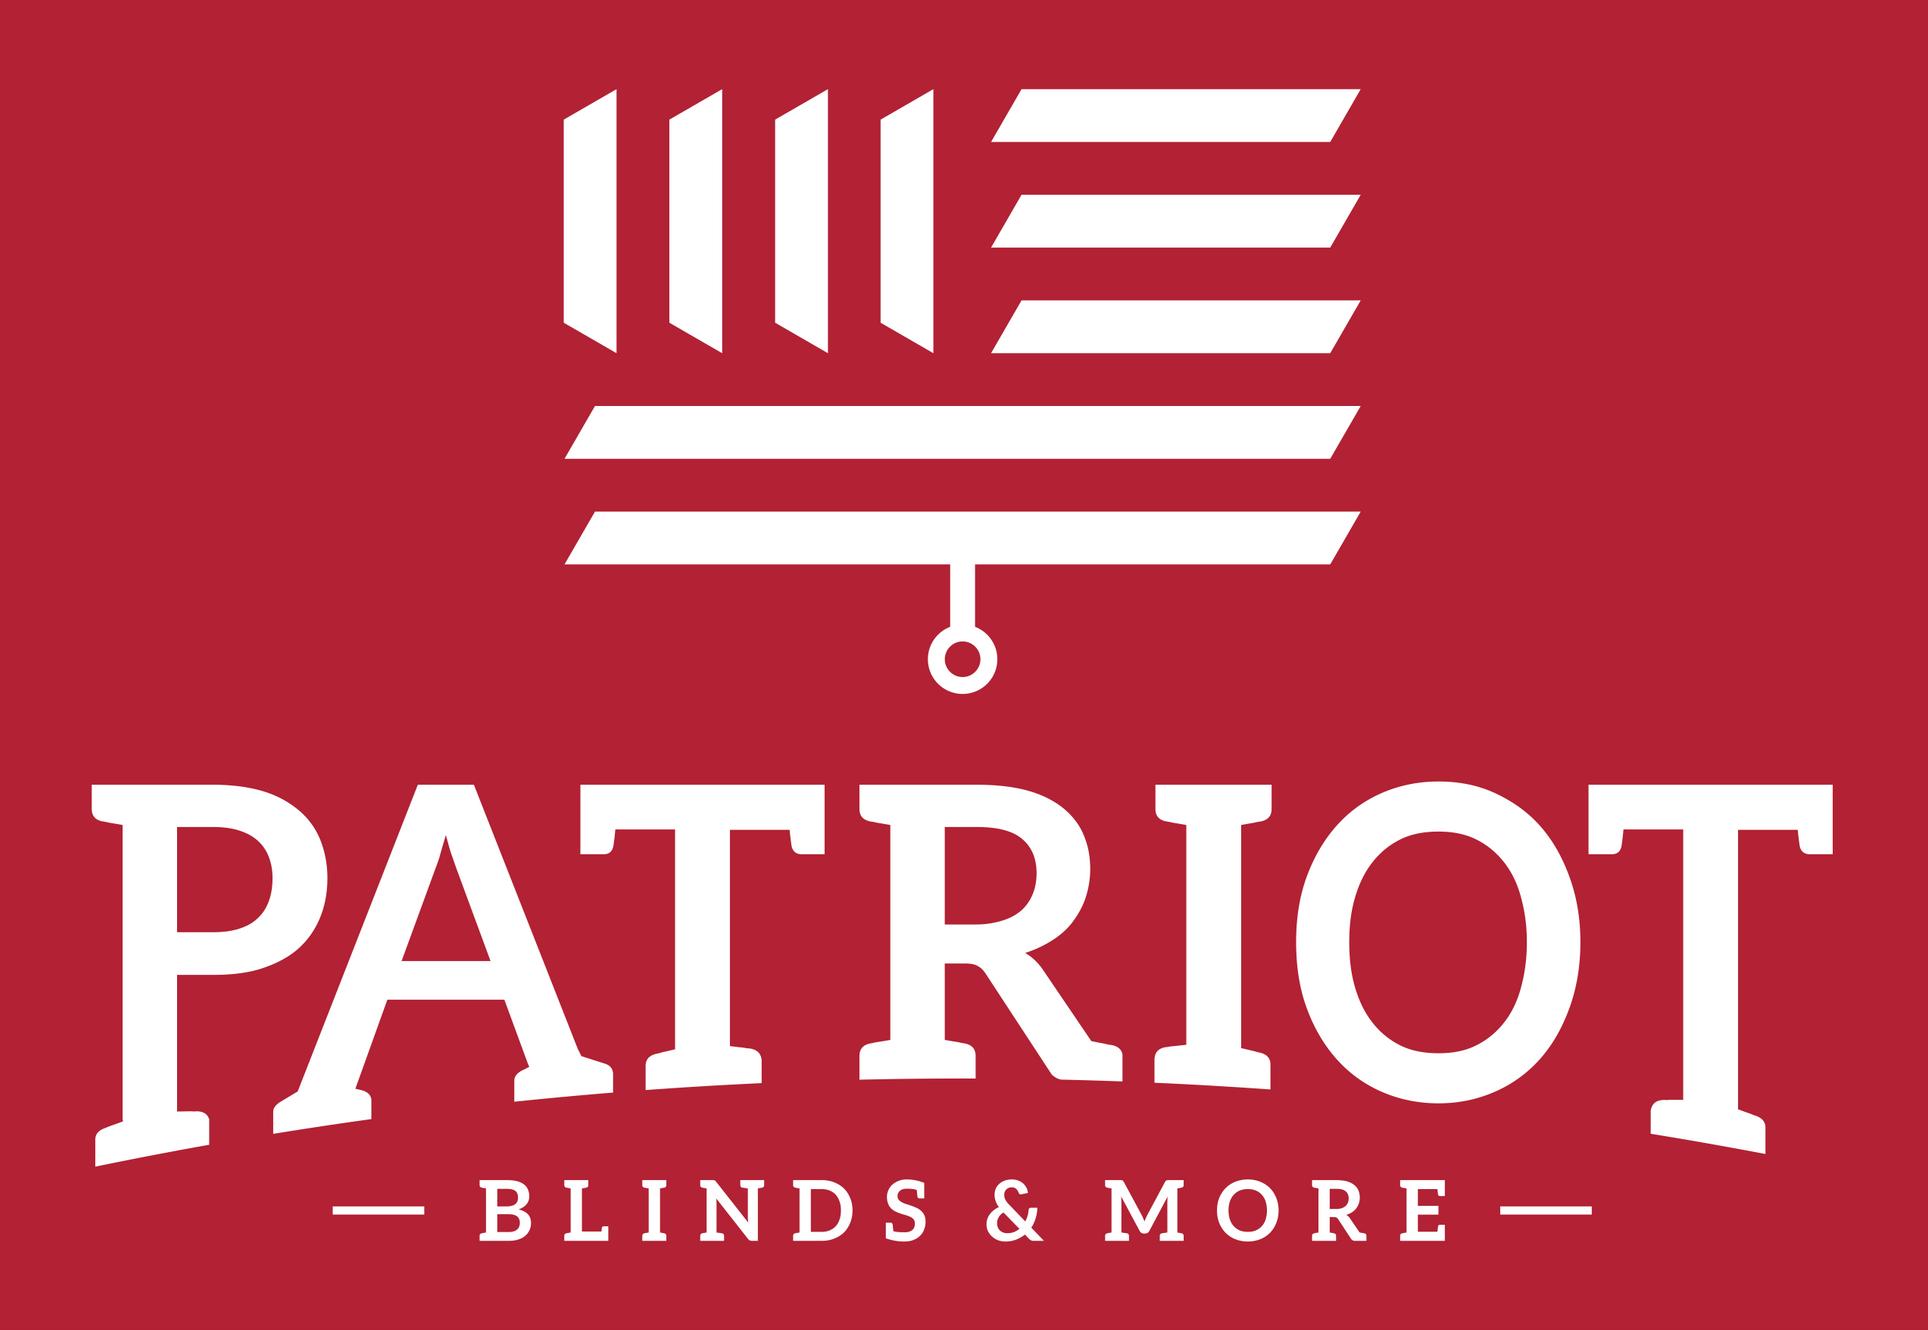 Patriotblinds